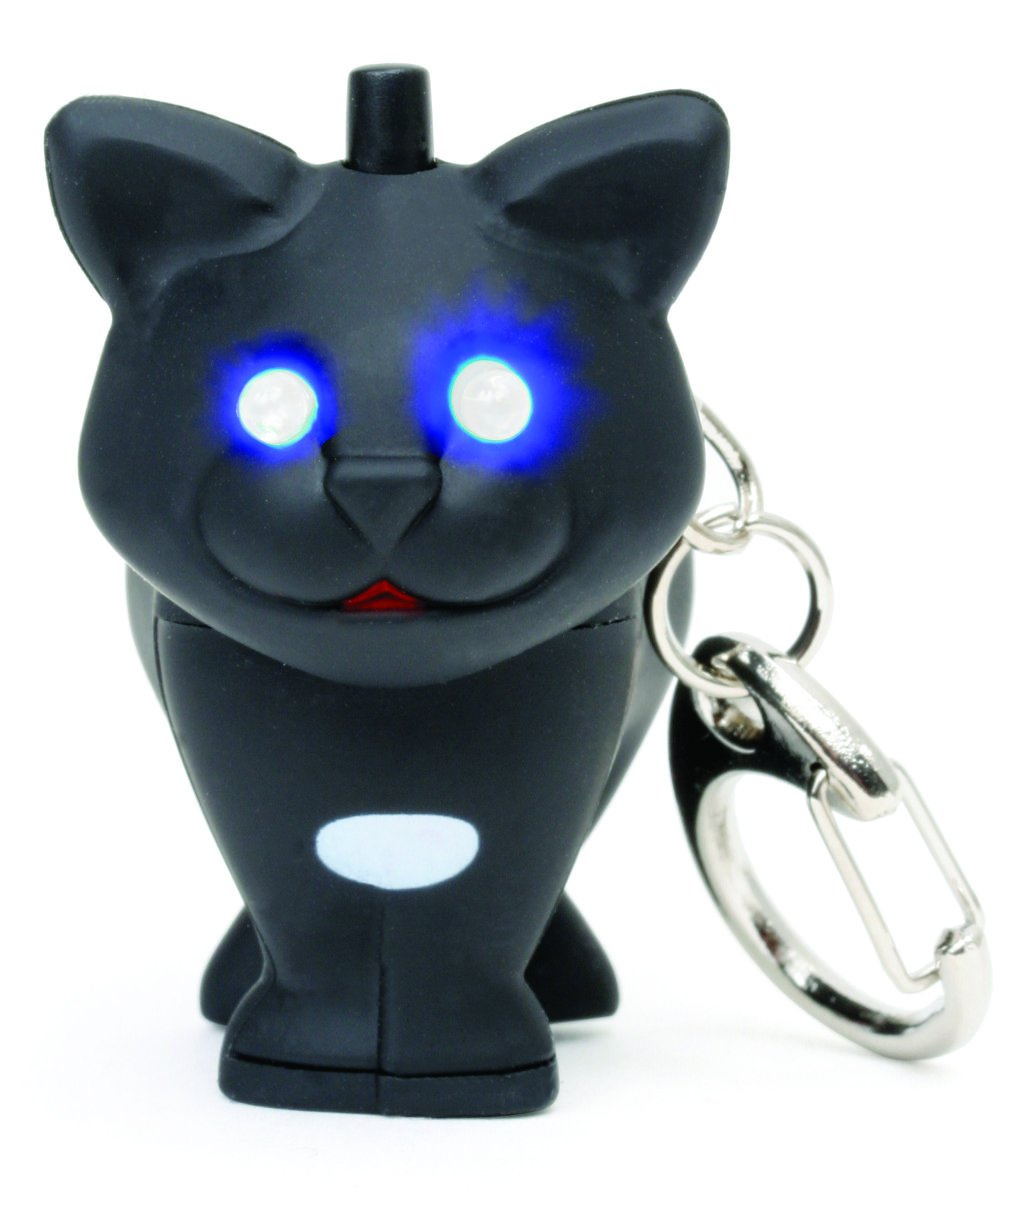 Kikkerland KRL26-CDU-EU Cat LED Keychain Carded/CDU KRL21-CDU